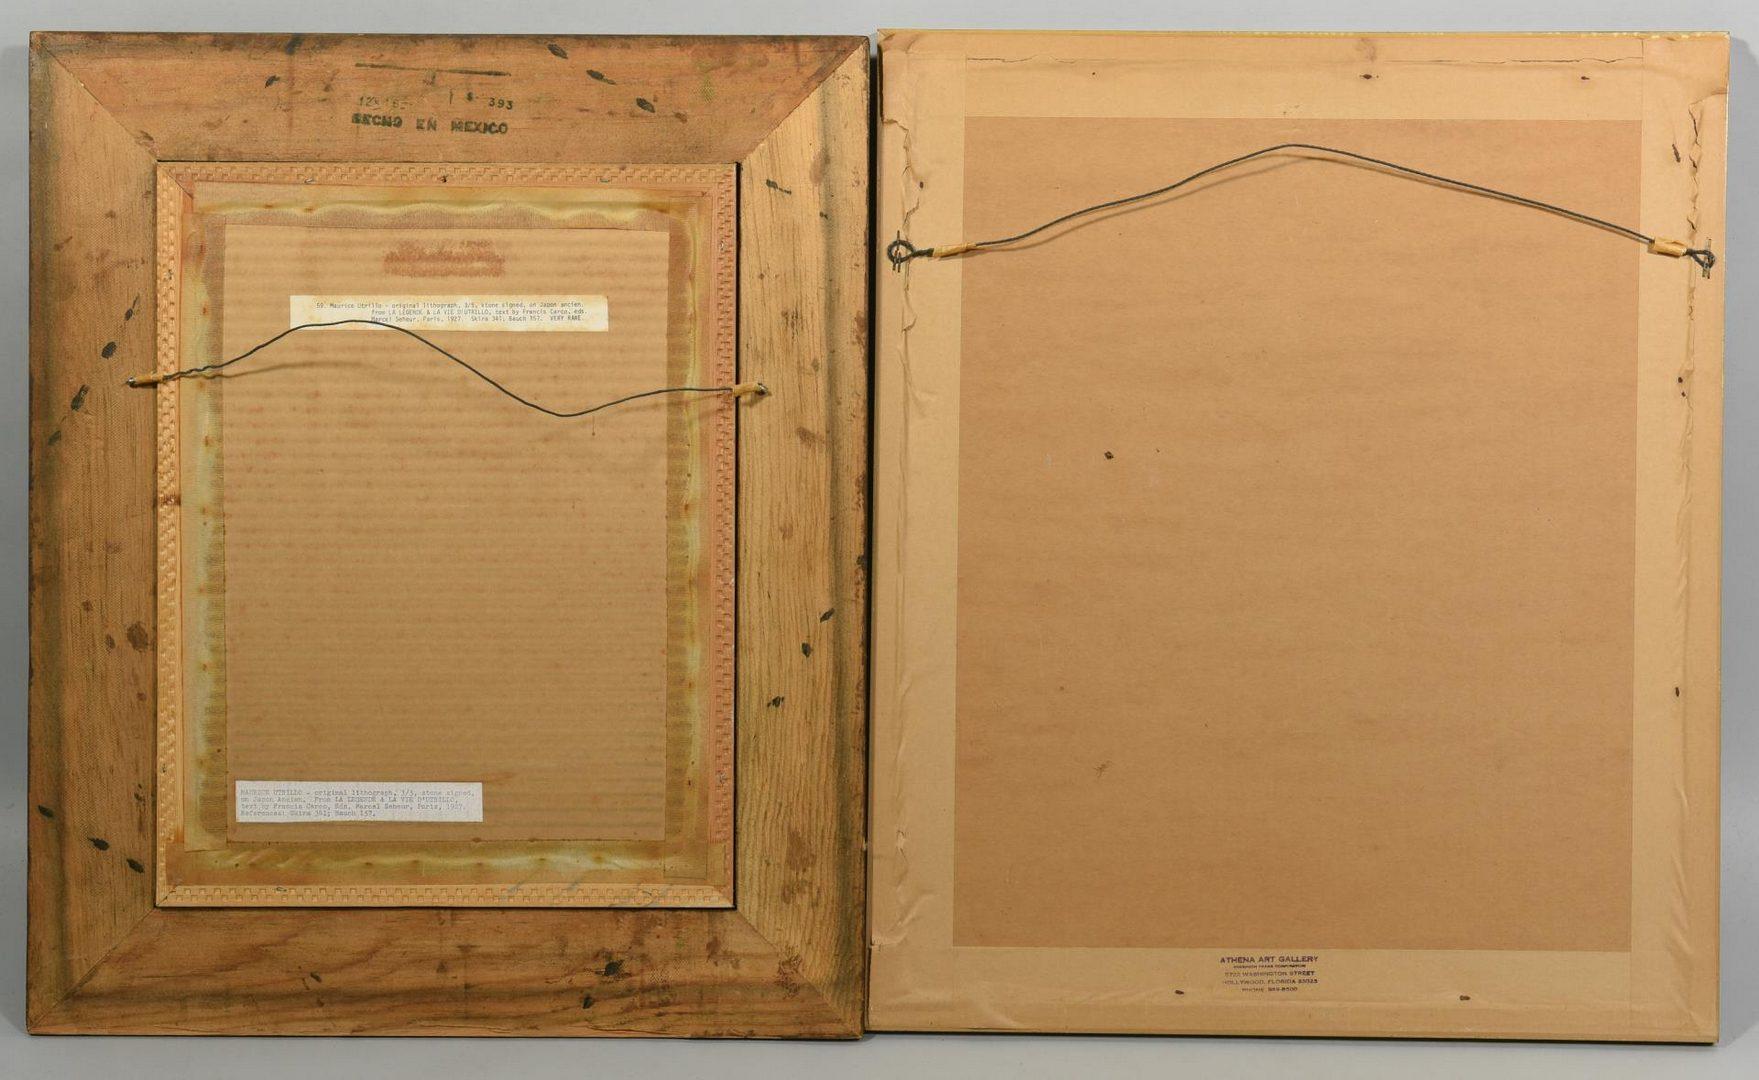 Lot 53: Pr. 20th Century Prints, Kleinholz & Utrillo